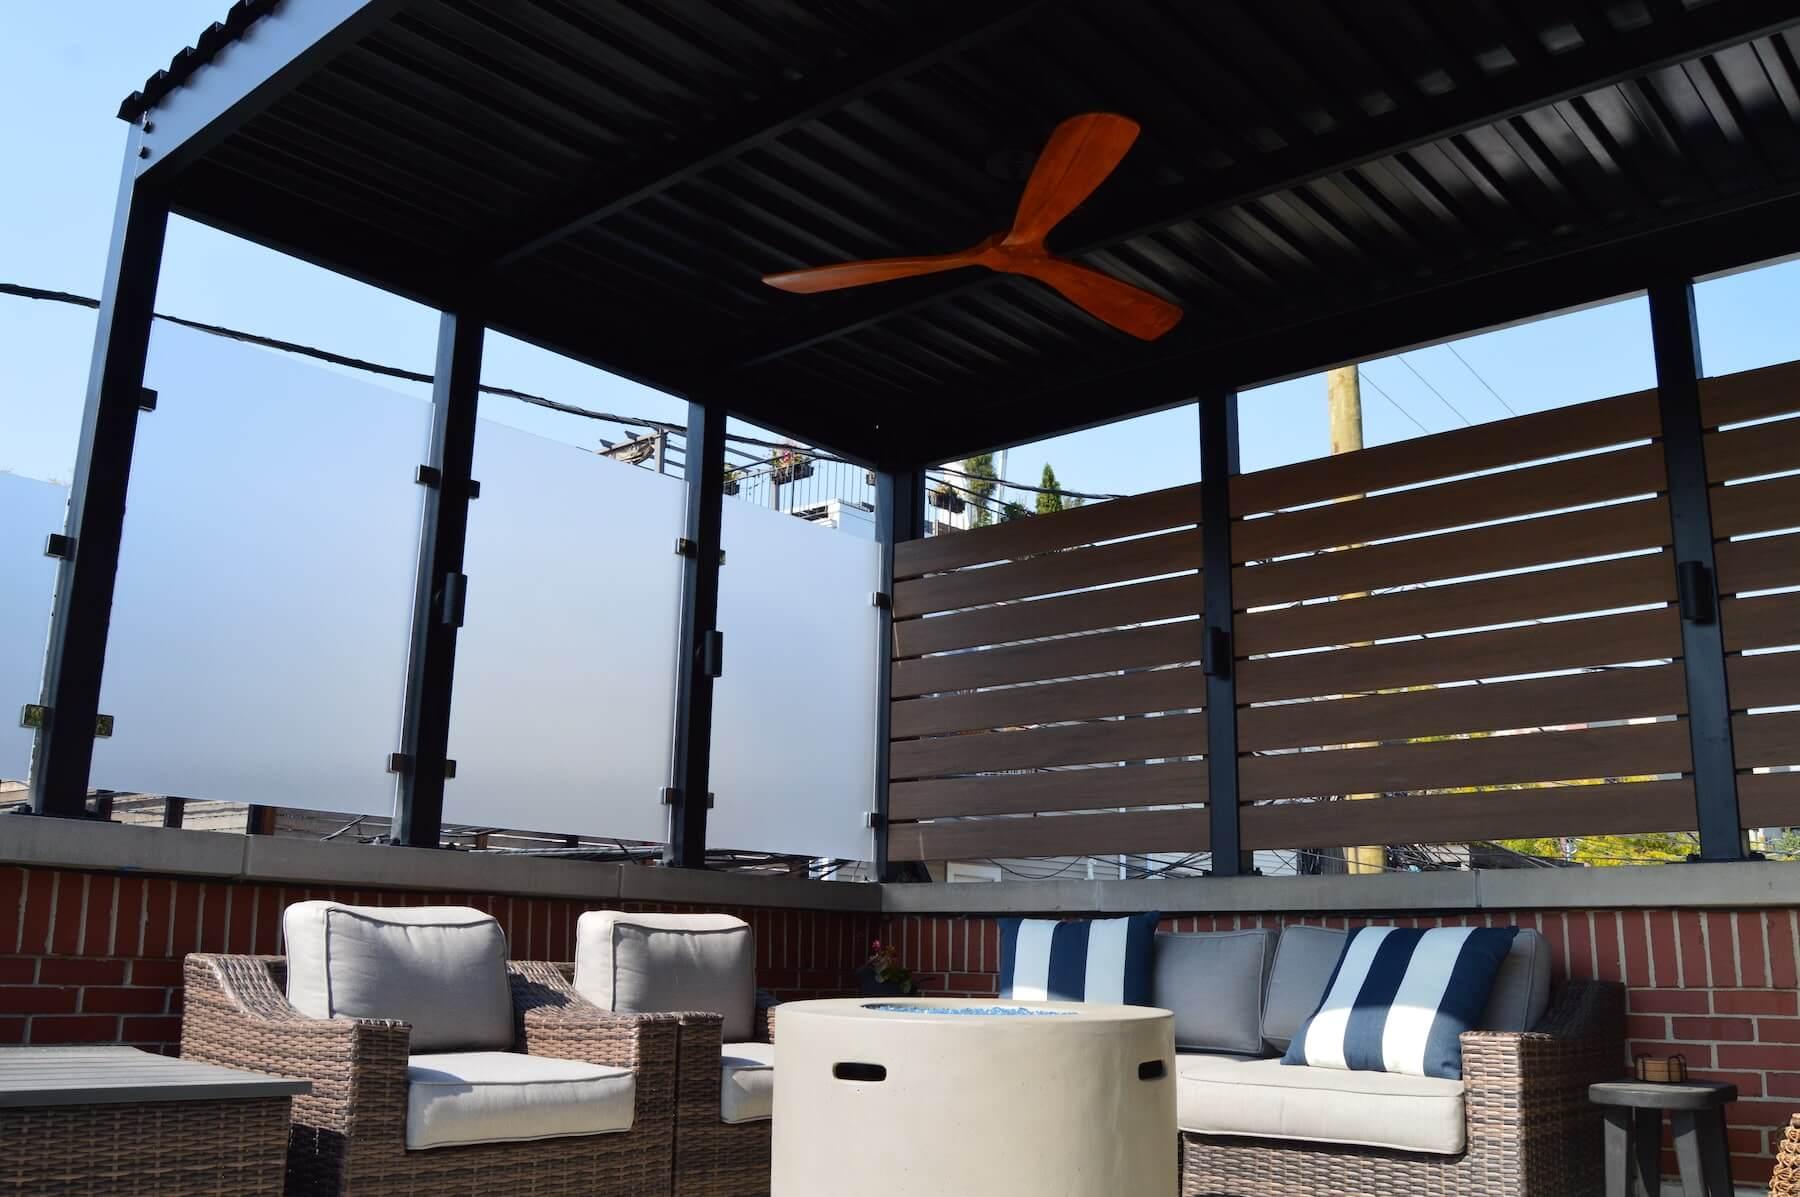 rooftop deck lounge furniture pergola chicago il